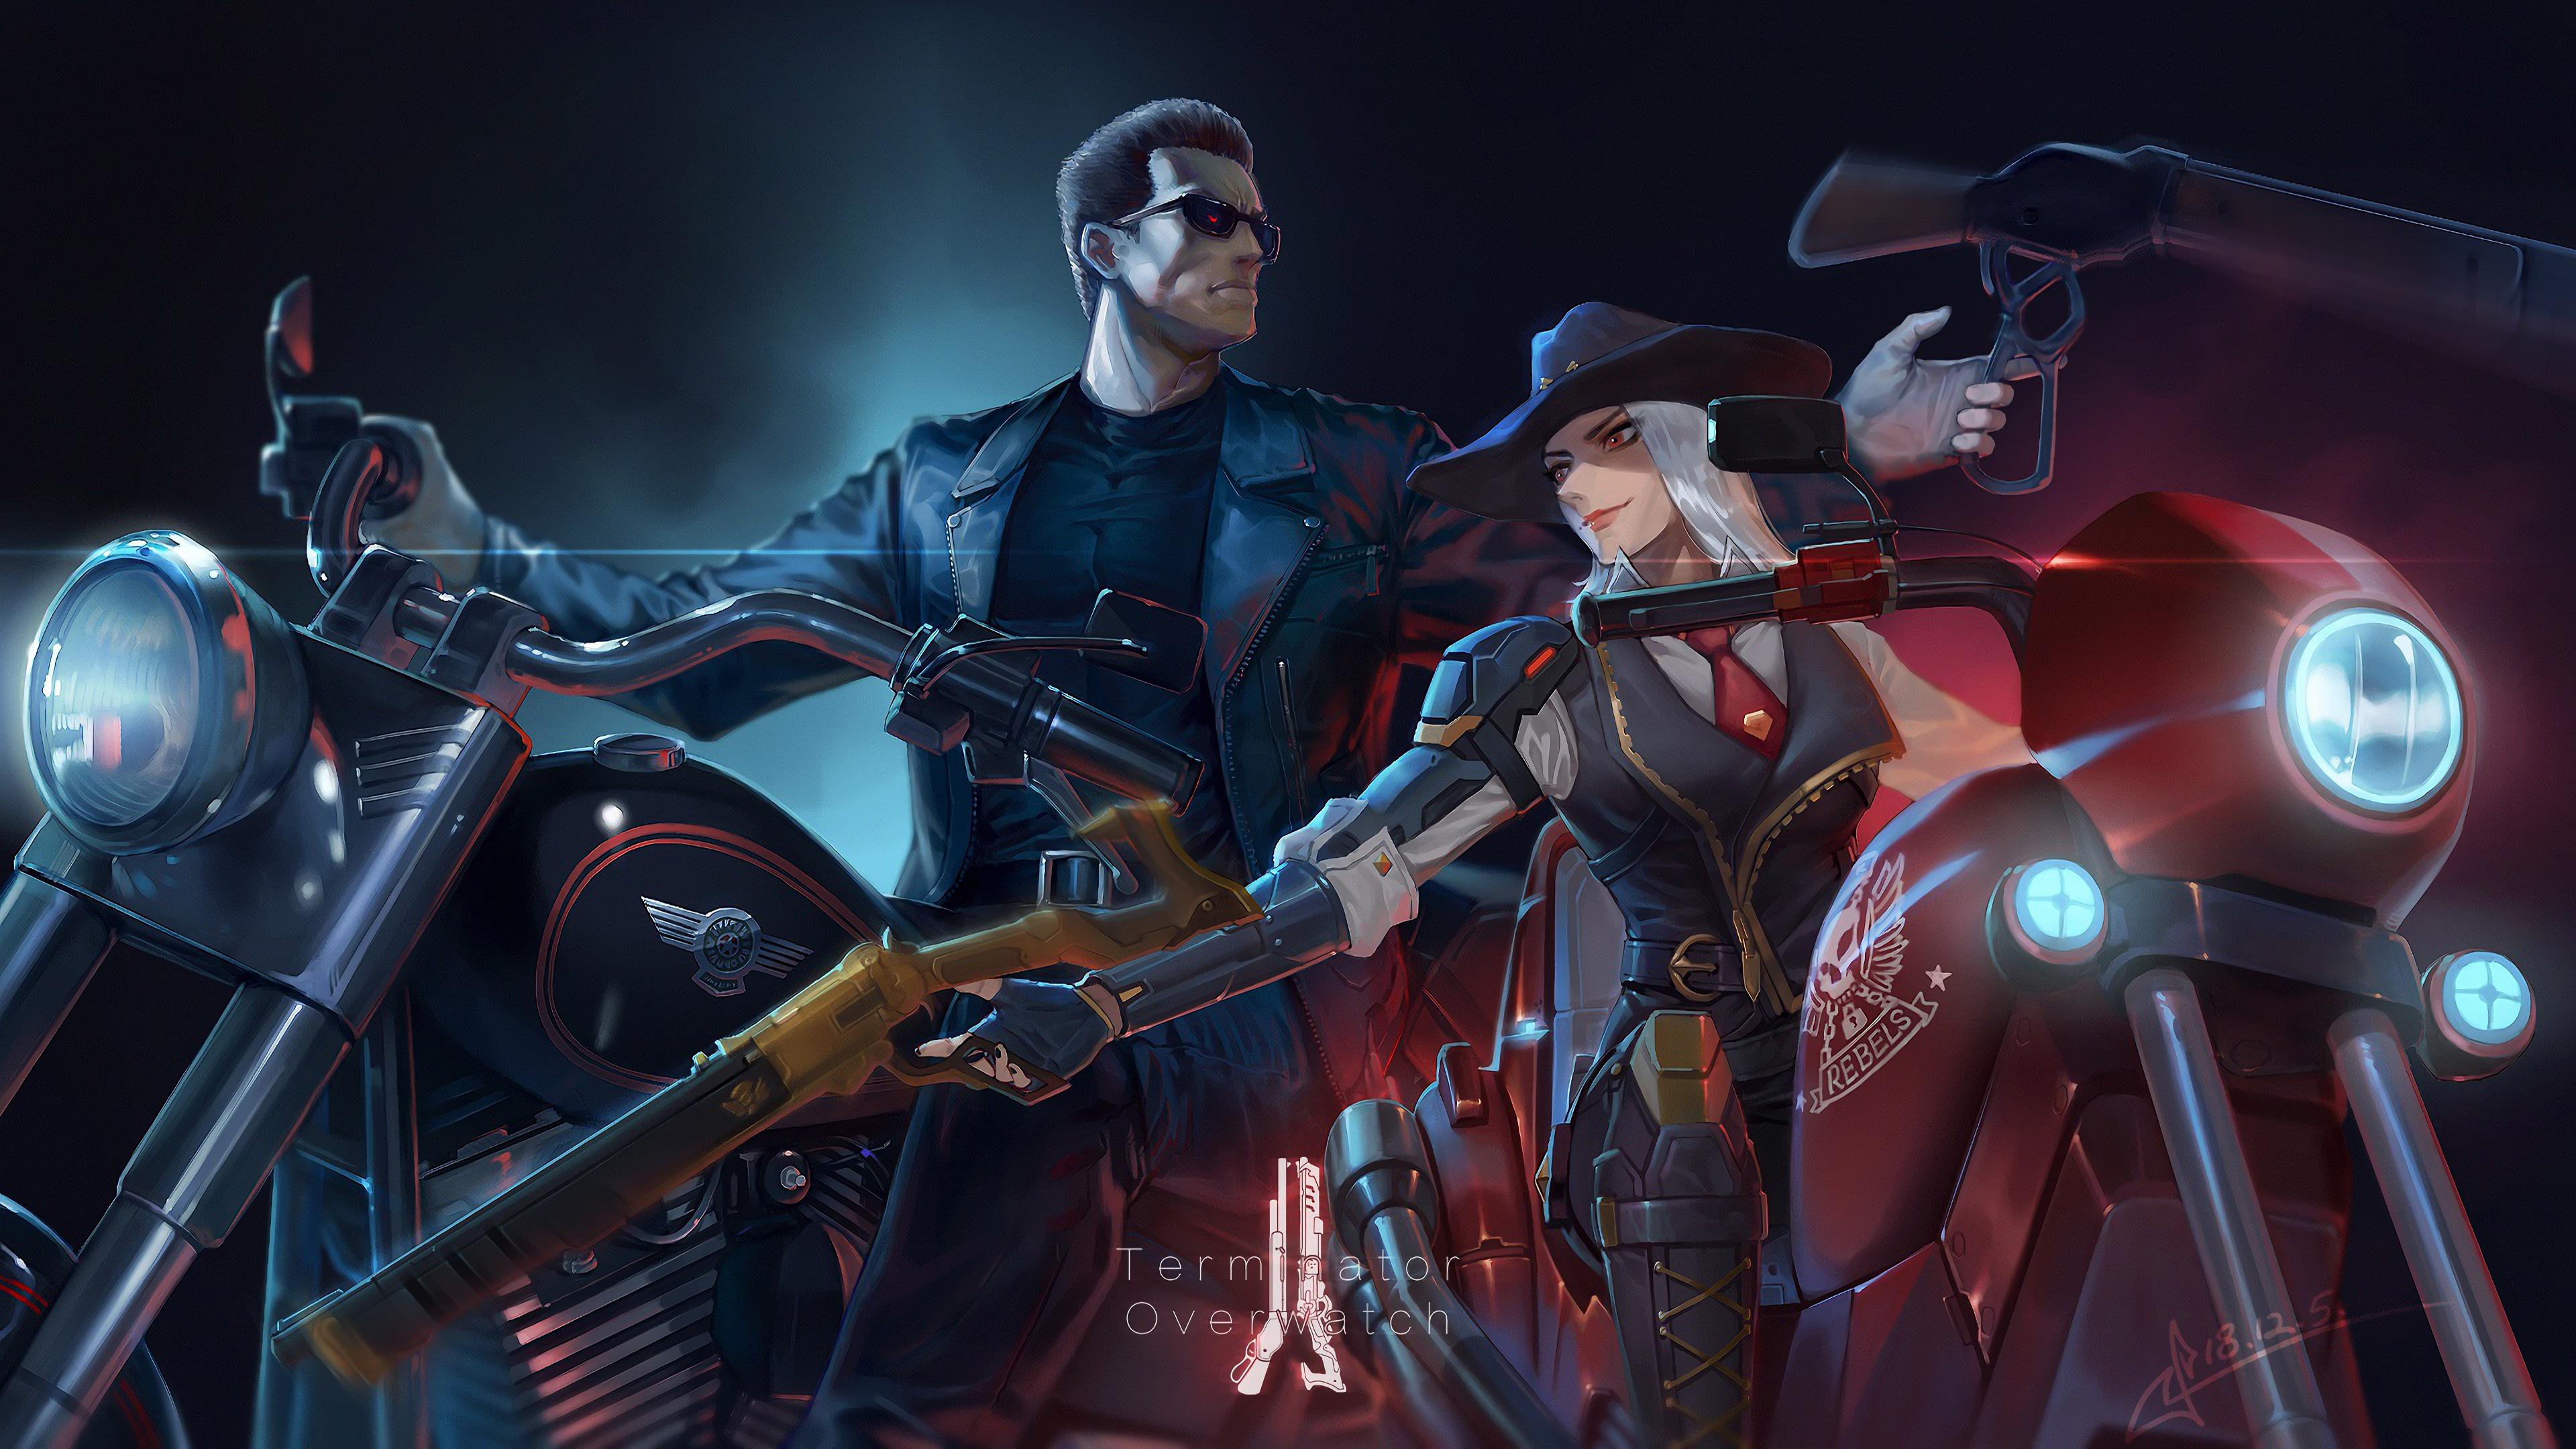 Ashe Terminator Overwatch 4K, HD Games